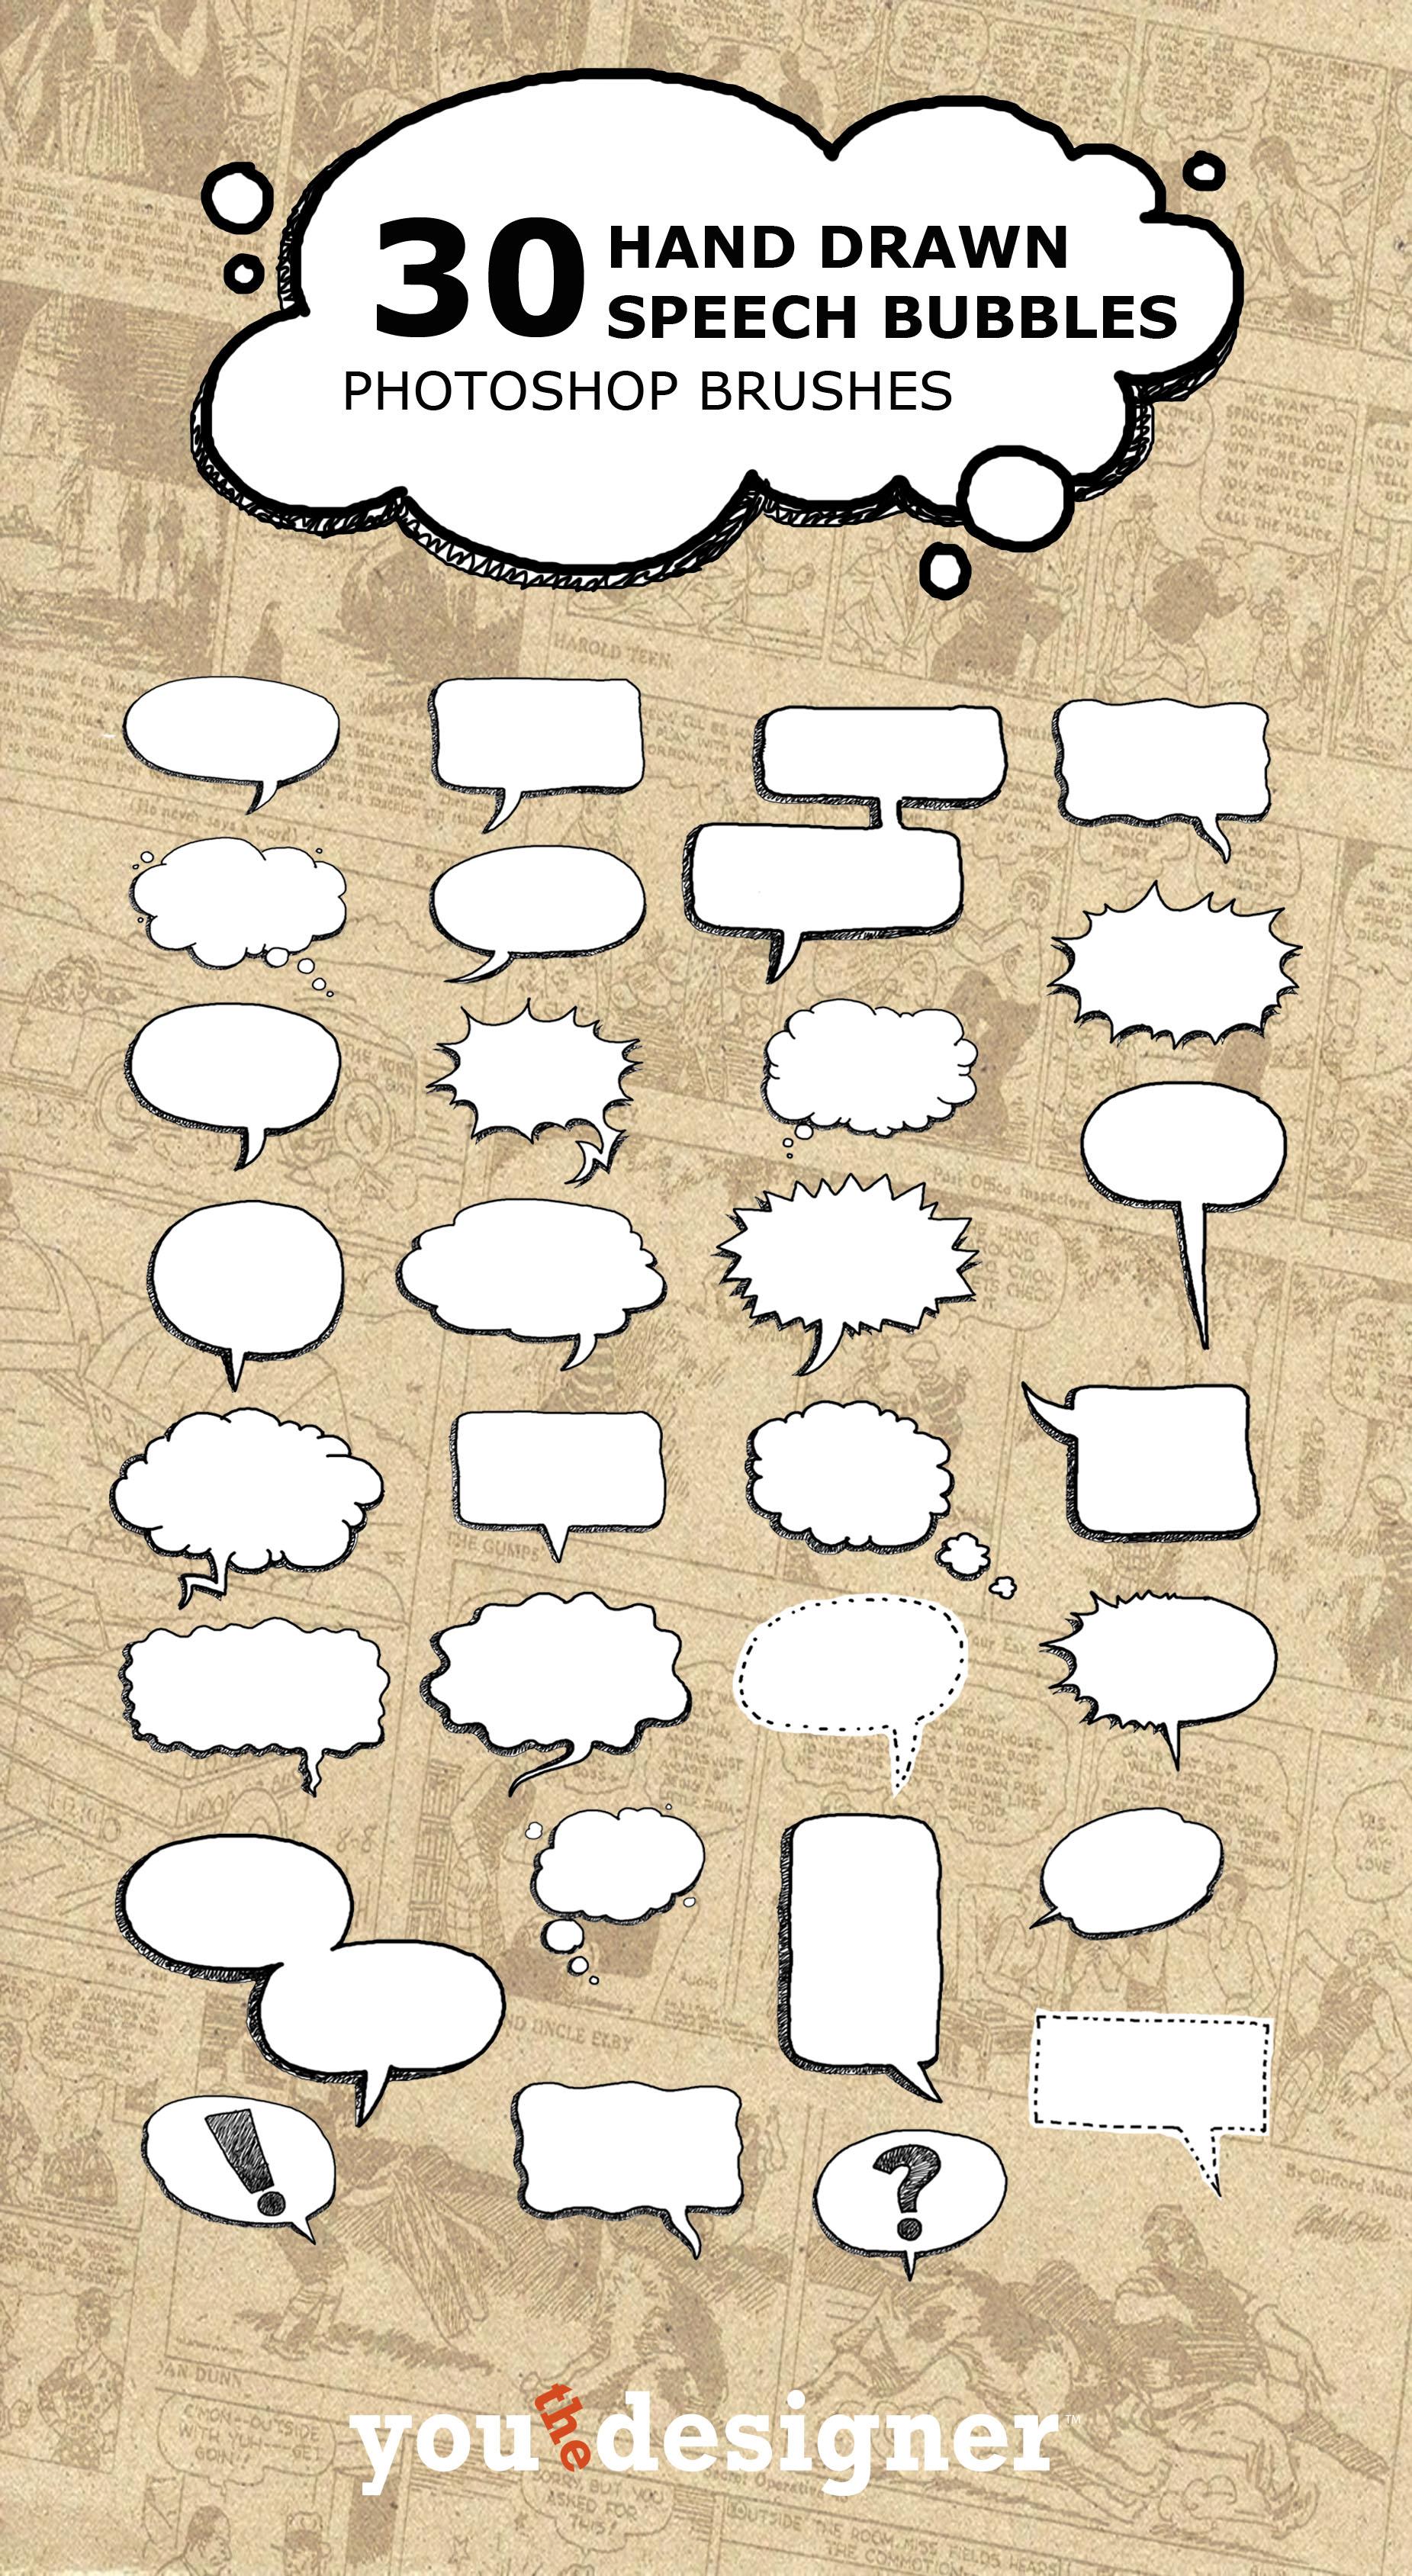 Drawn bubble conversation bubble Speech Hand Brushes  Drawn